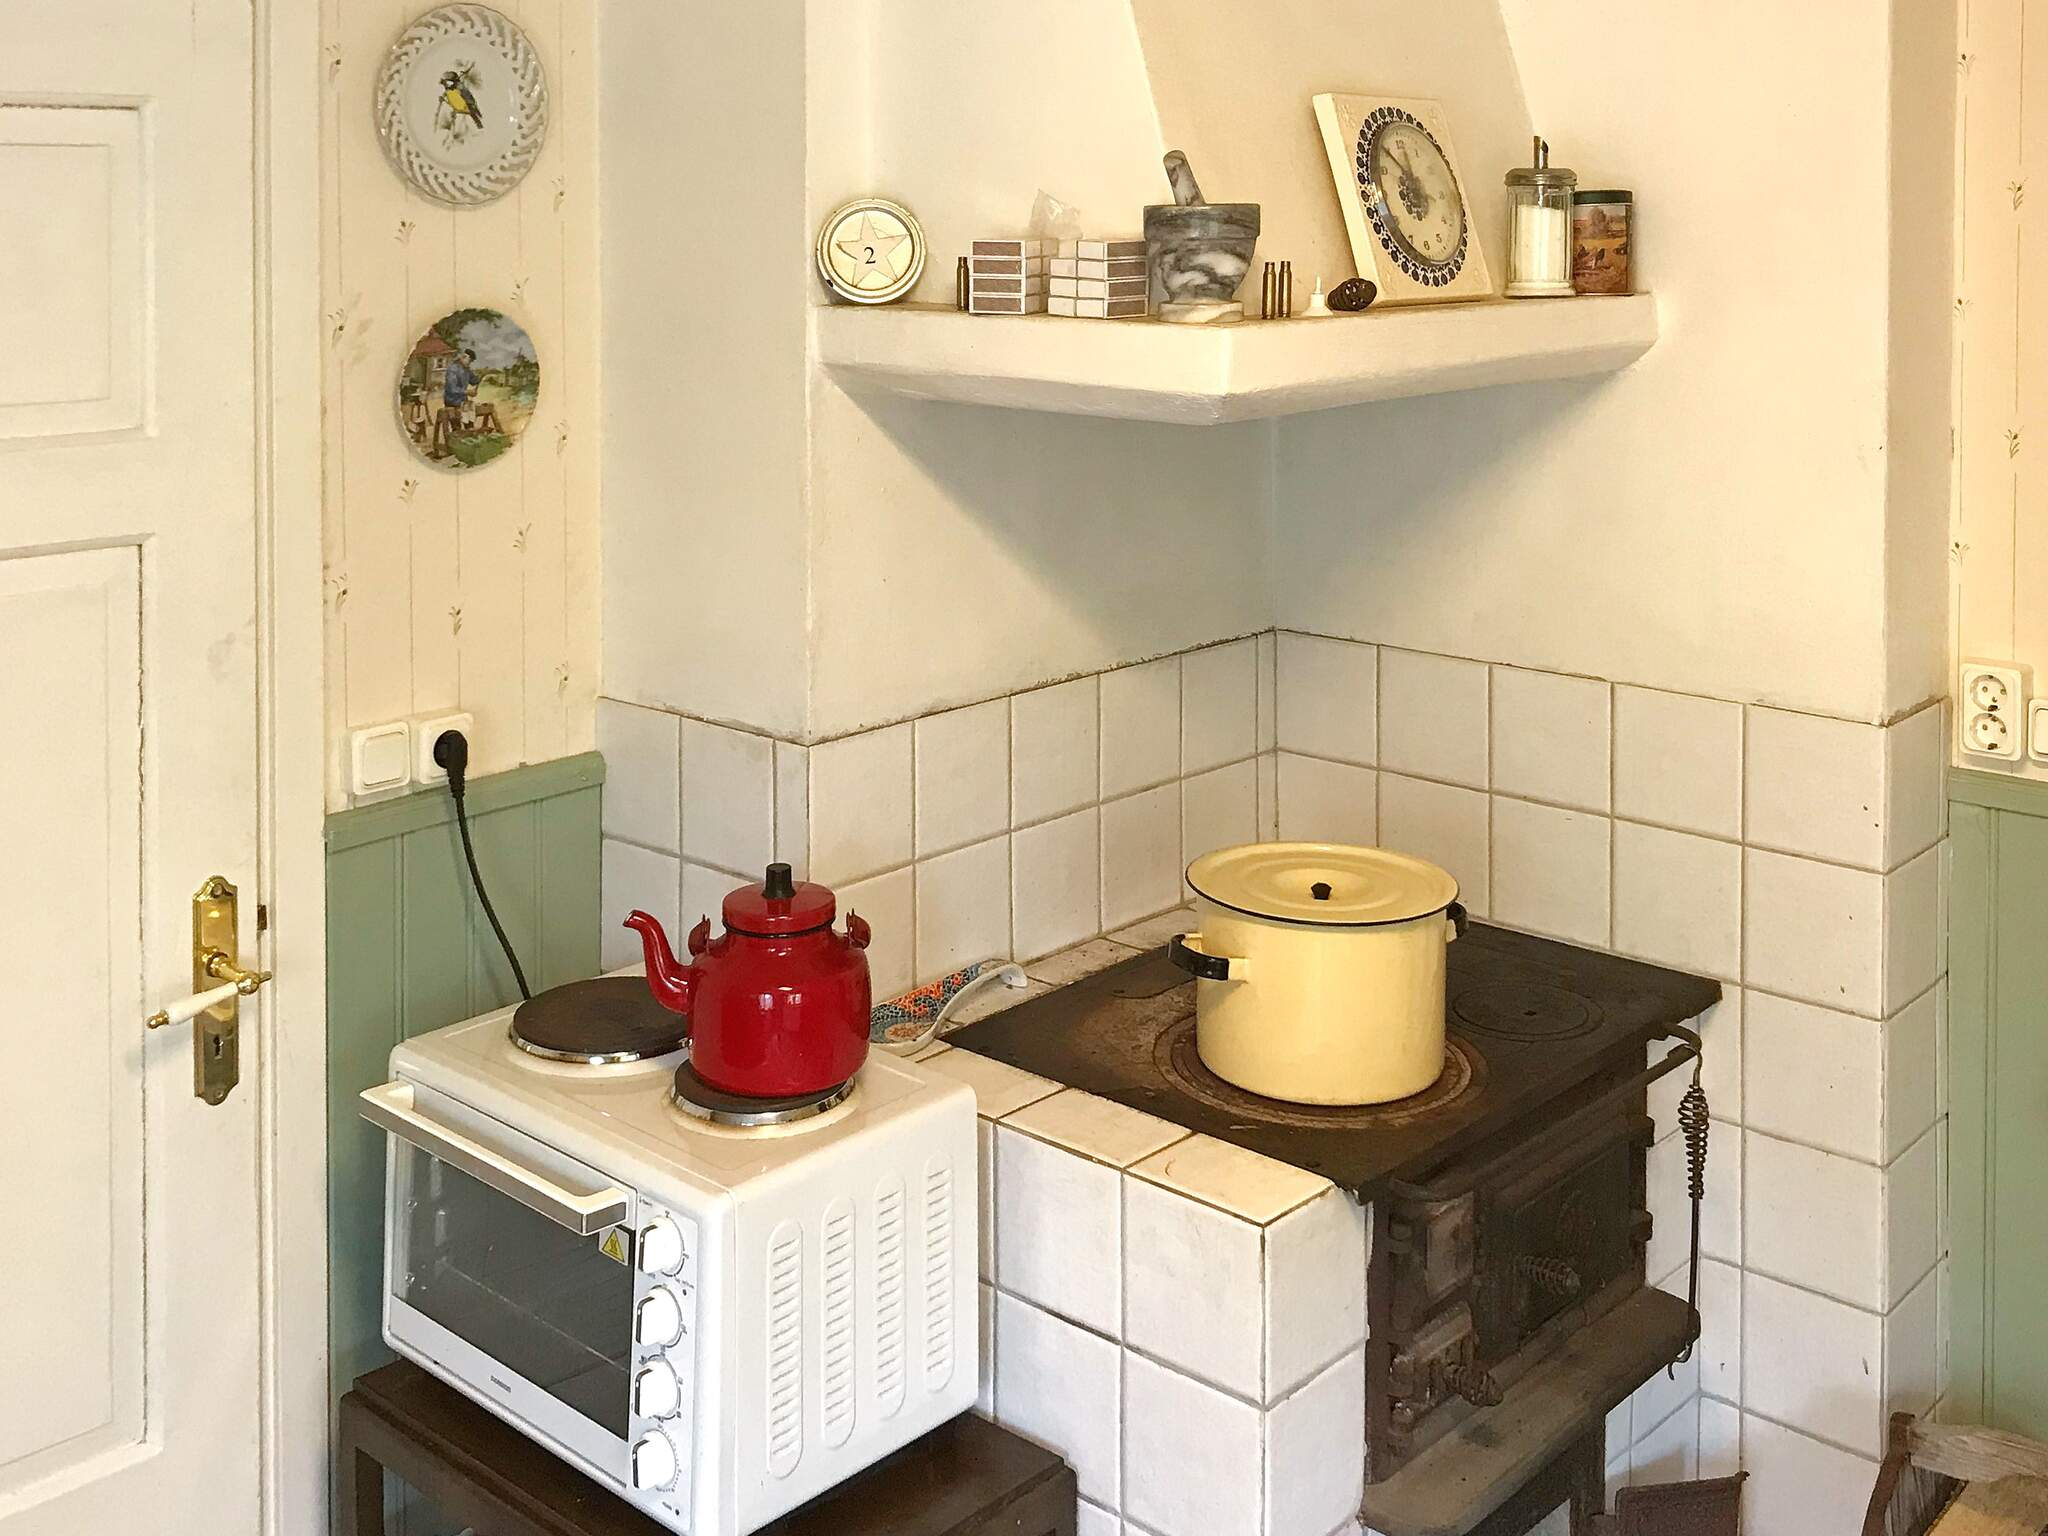 Ferienhaus Karlskrona (2624317), Eringsboda, Blekinge län, Südschweden, Schweden, Bild 3